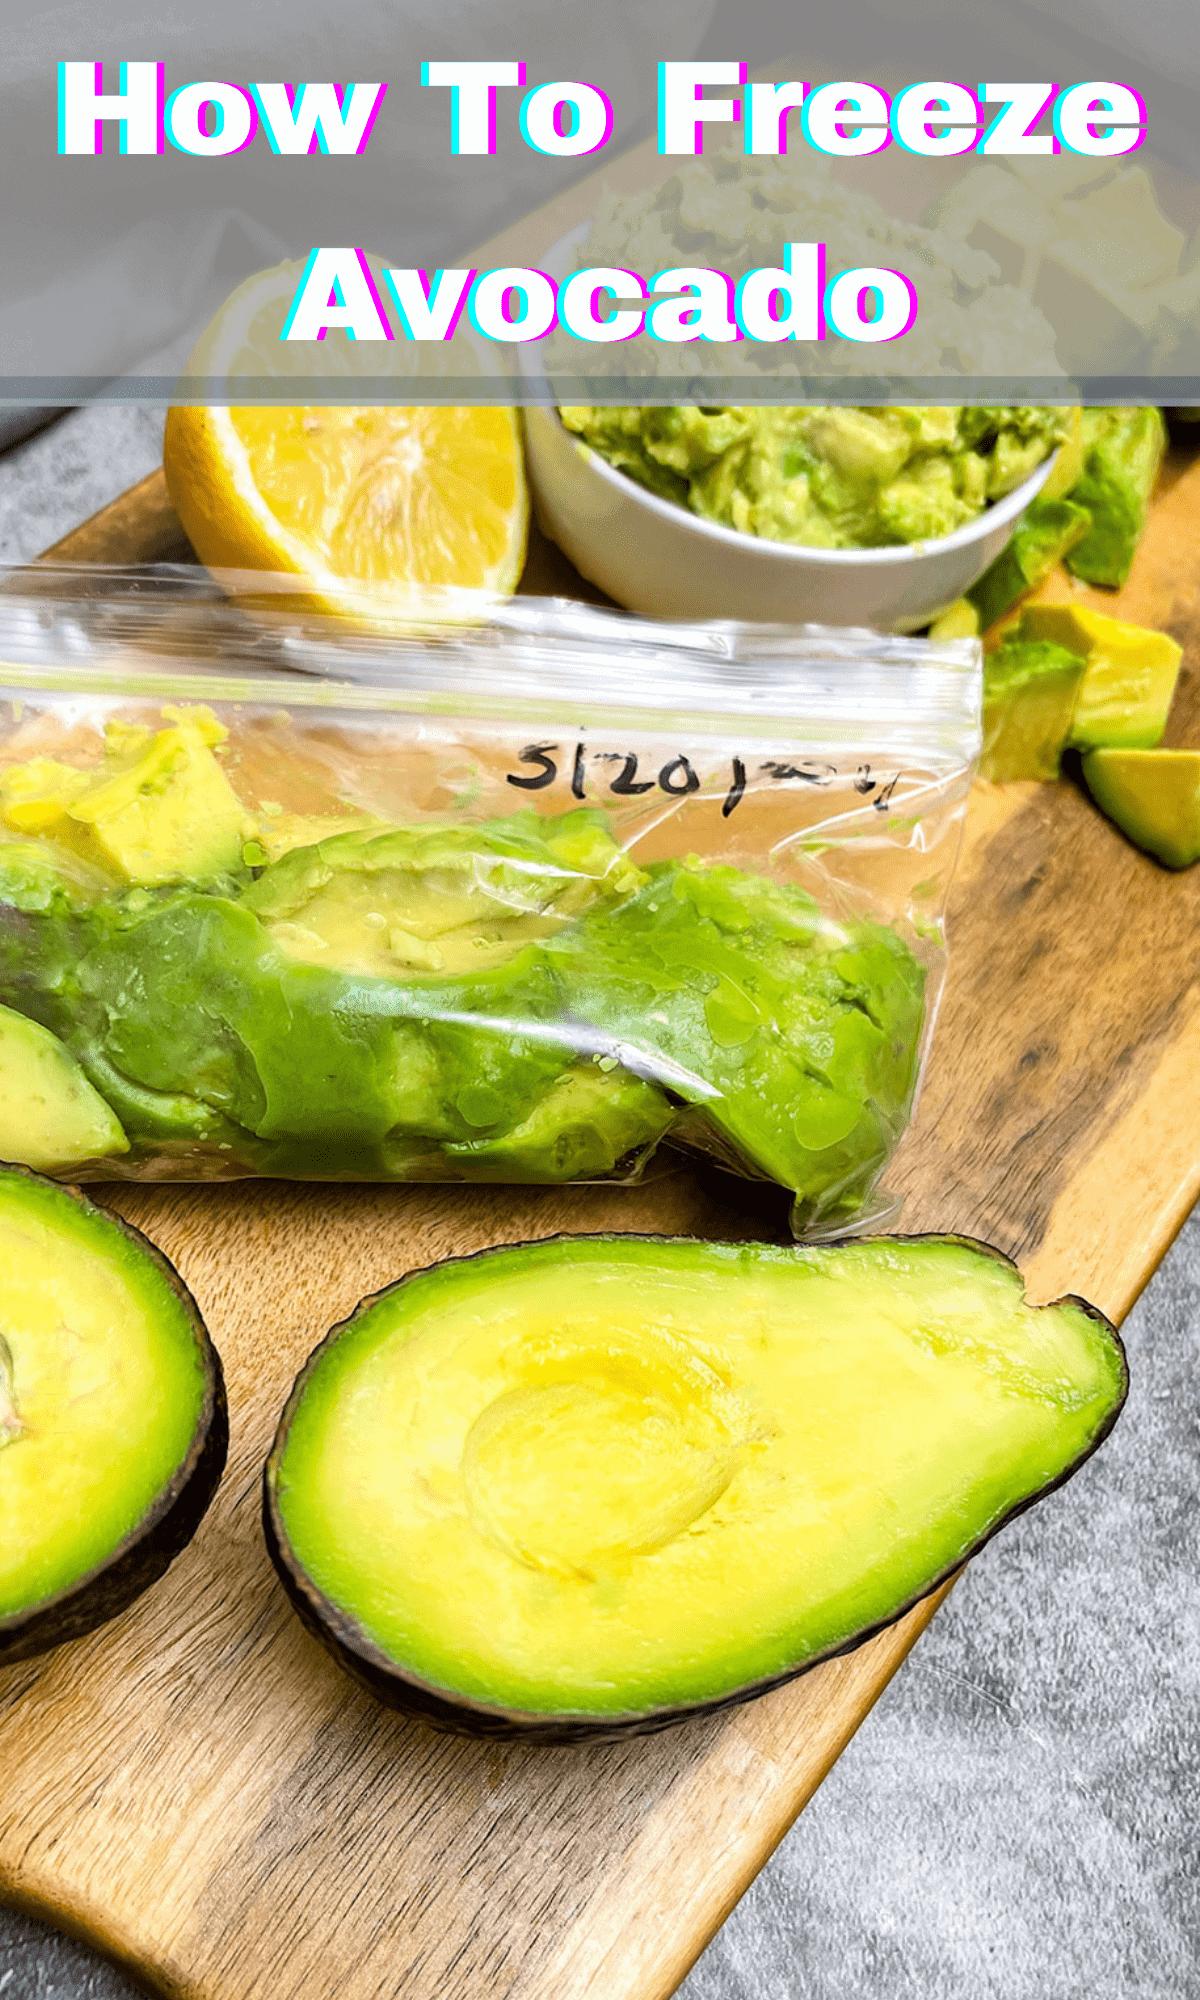 How to Freeze An Avocado?